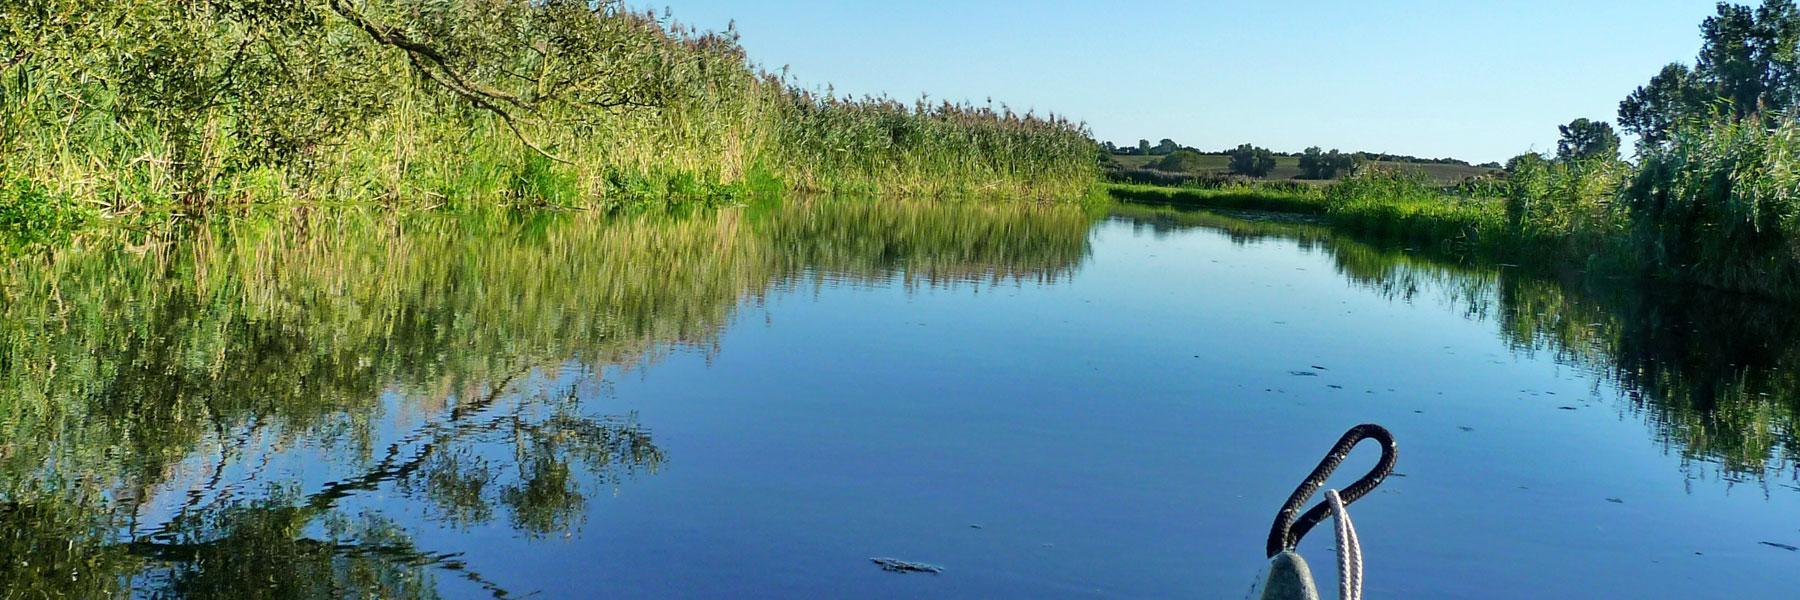 Fluß Tollense - Kanustation Klempenow